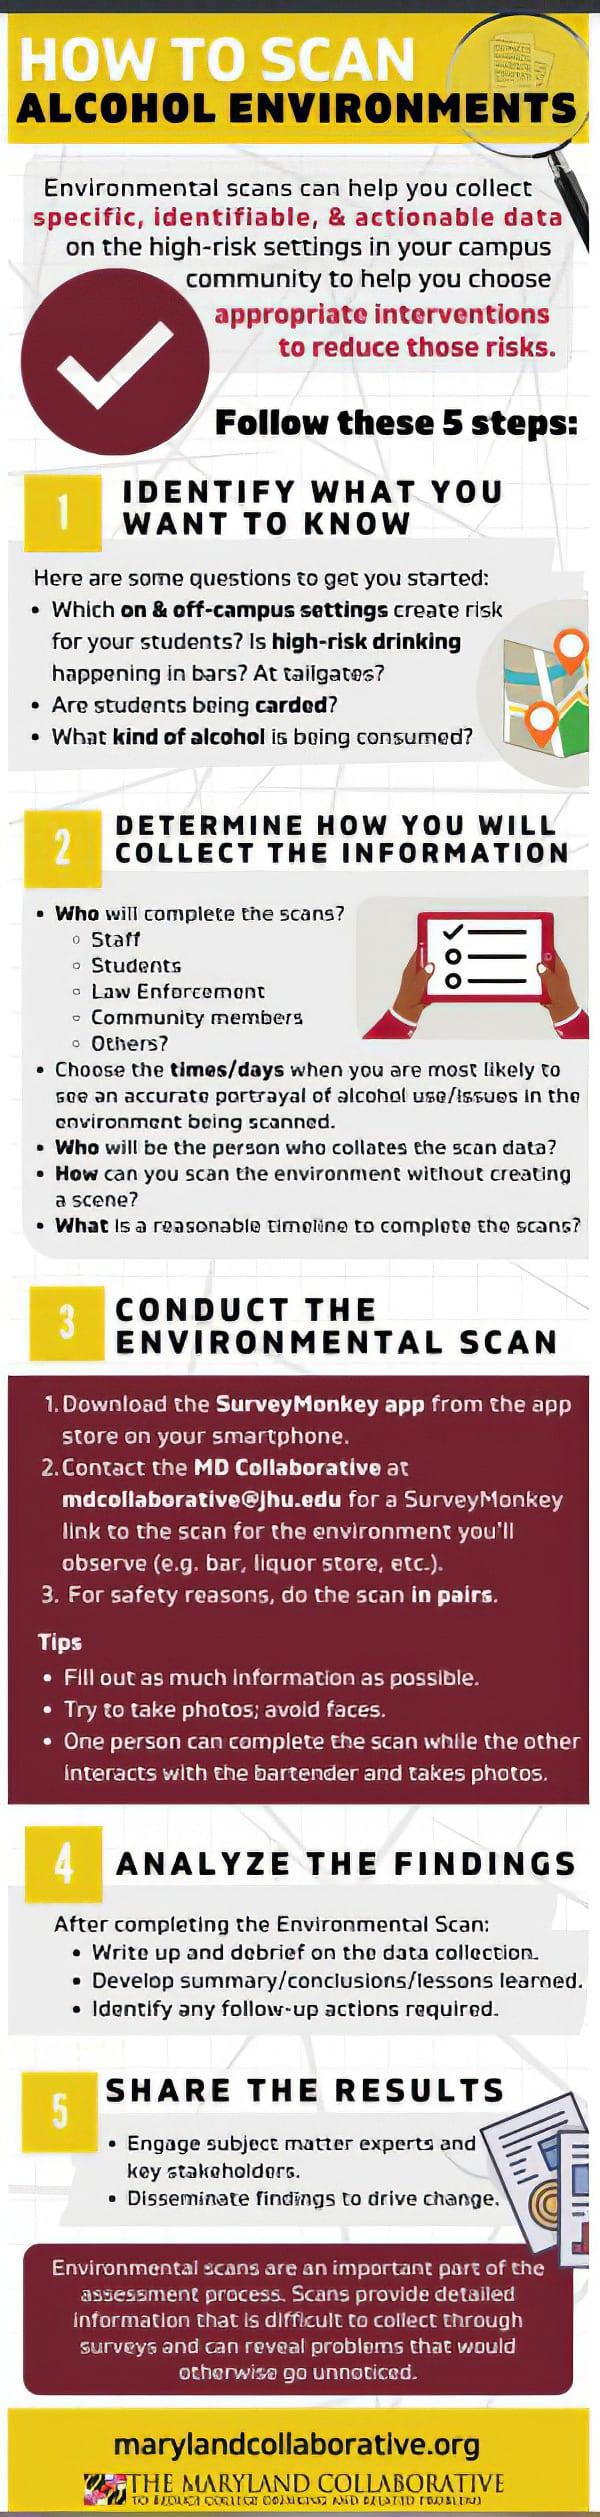 Environmental Scan Infographic